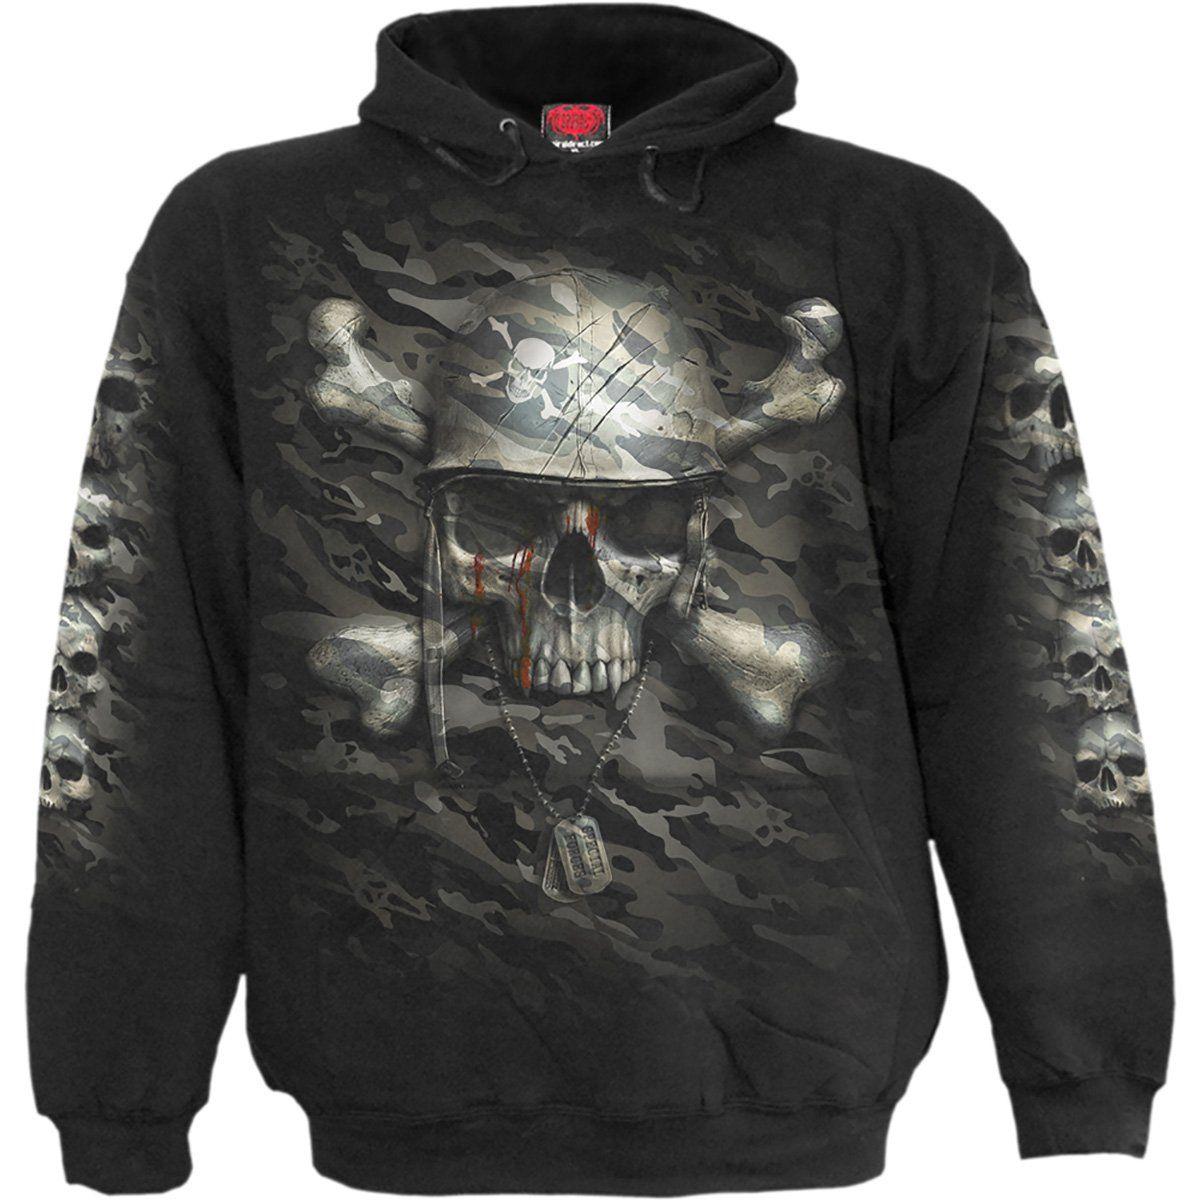 Skul - Gothic,Goth,Skull Death Spiral Boss Reaper Black Hoodie Special Order